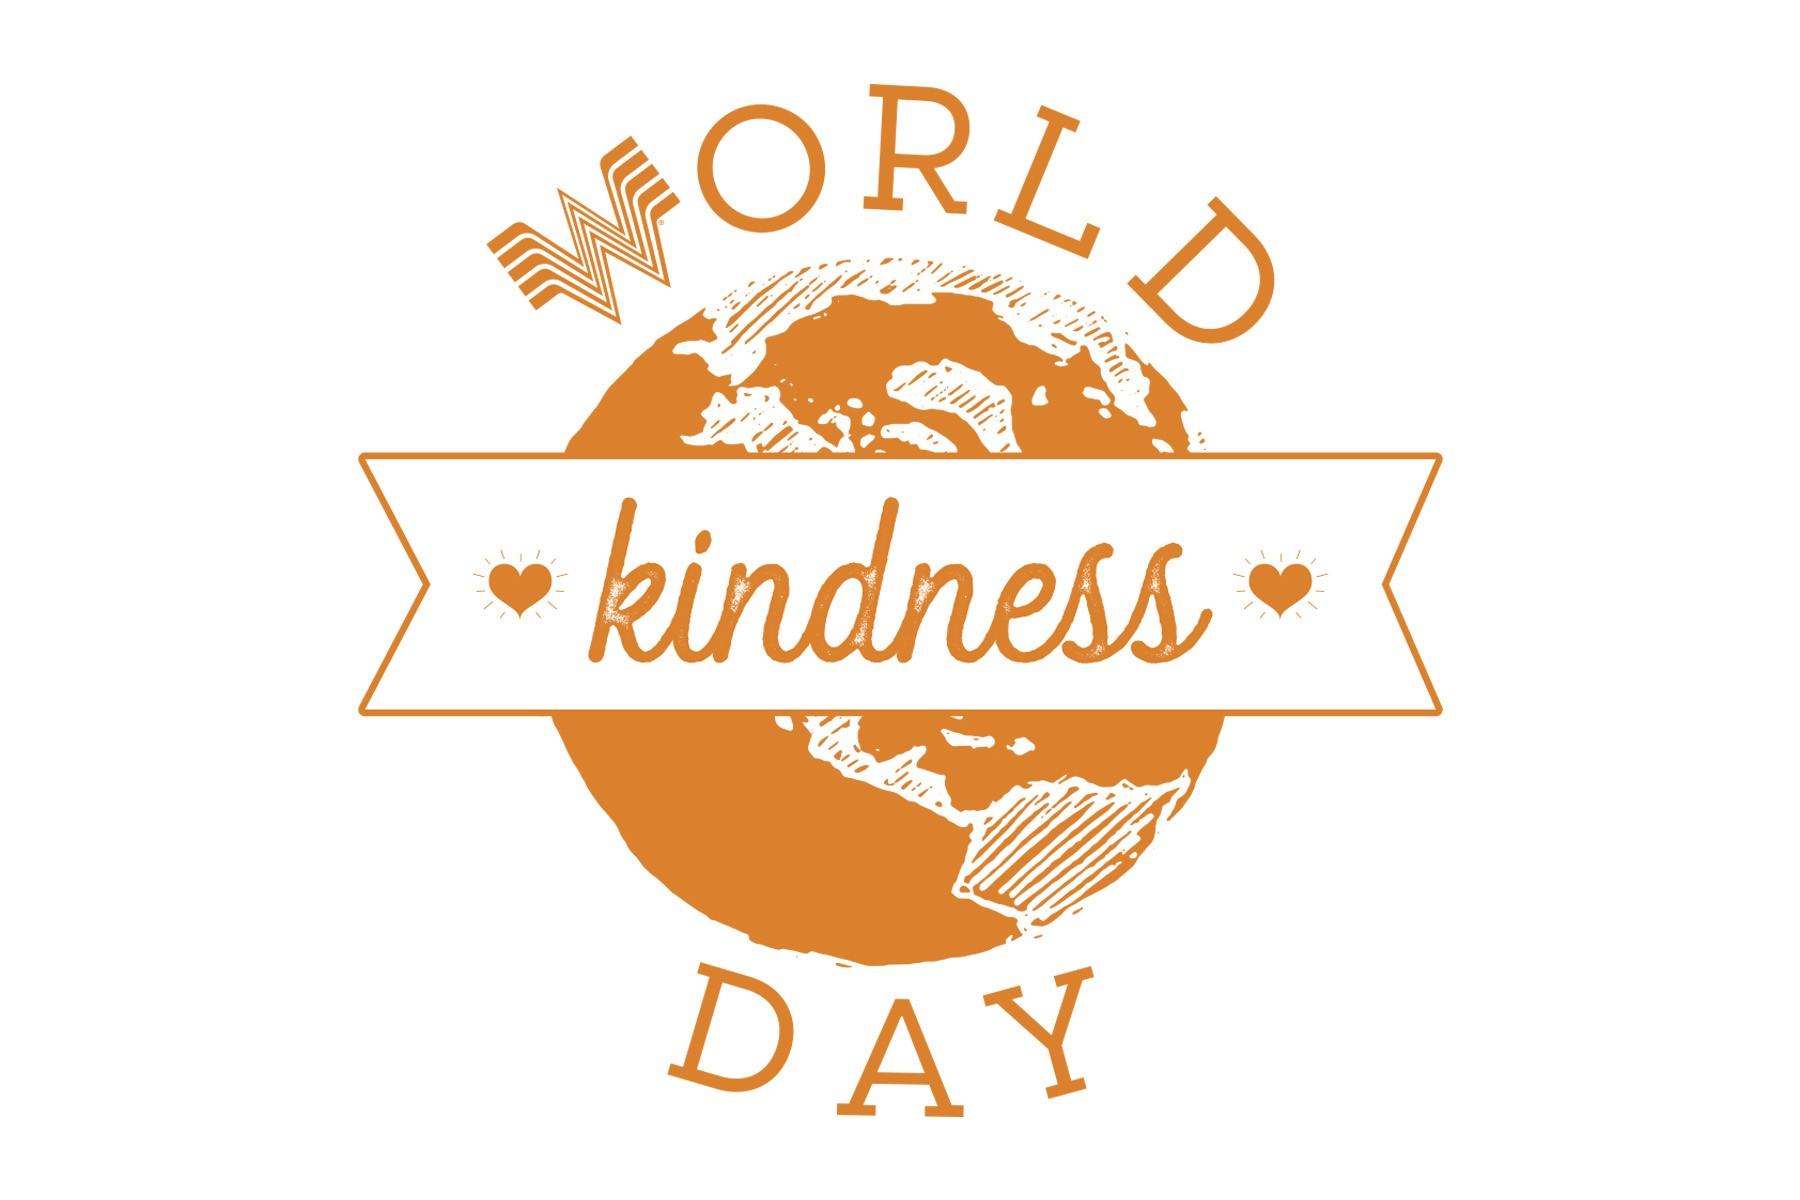 world kindness day - photo #20